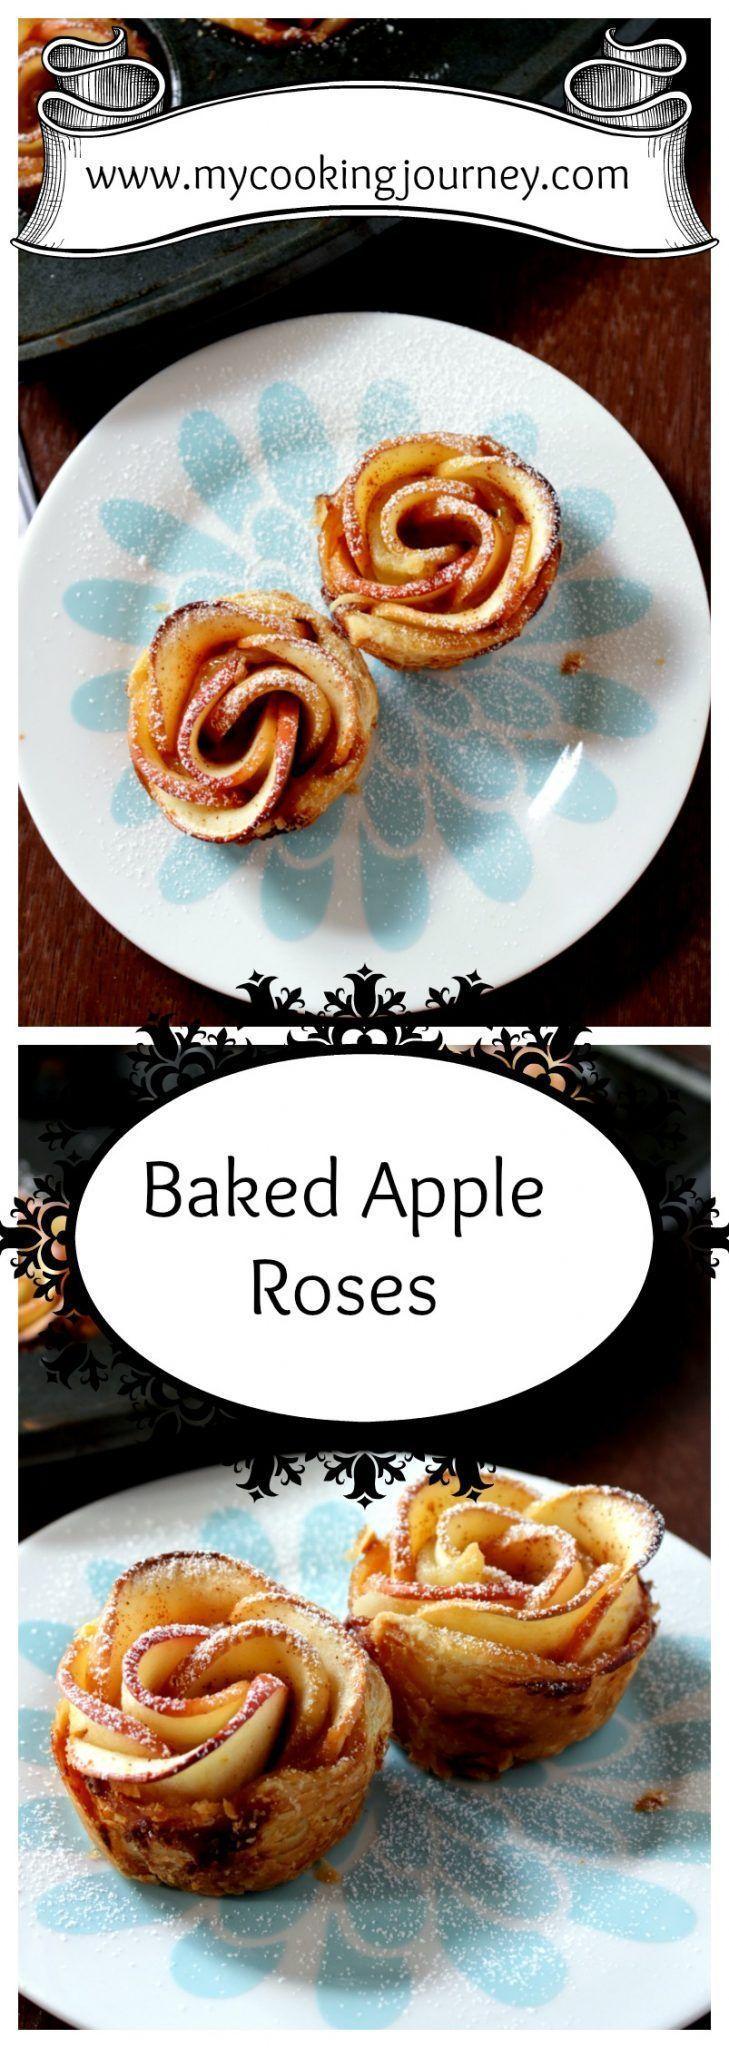 Bratapfel-Rosen - Apfel-Rosen mit Blätterteig - #Apfelrosen #Blätterteig #BratapfelRosen #mit #blätterteigrosenmitapfel Bratapfel-Rosen - Apfel-Rosen mit Blätterteig - #Apfelrosen #Blätterteig #BratapfelRosen #mit #apfelrosenblätterteig Bratapfel-Rosen - Apfel-Rosen mit Blätterteig - #Apfelrosen #Blätterteig #BratapfelRosen #mit #blätterteigrosenmitapfel Bratapfel-Rosen - Apfel-Rosen mit Blätterteig - #Apfelrosen #Blätterteig #BratapfelRosen #mit #blätterteigrosenmitapfel Bratapfel-R #blätterteigrosenmitapfel